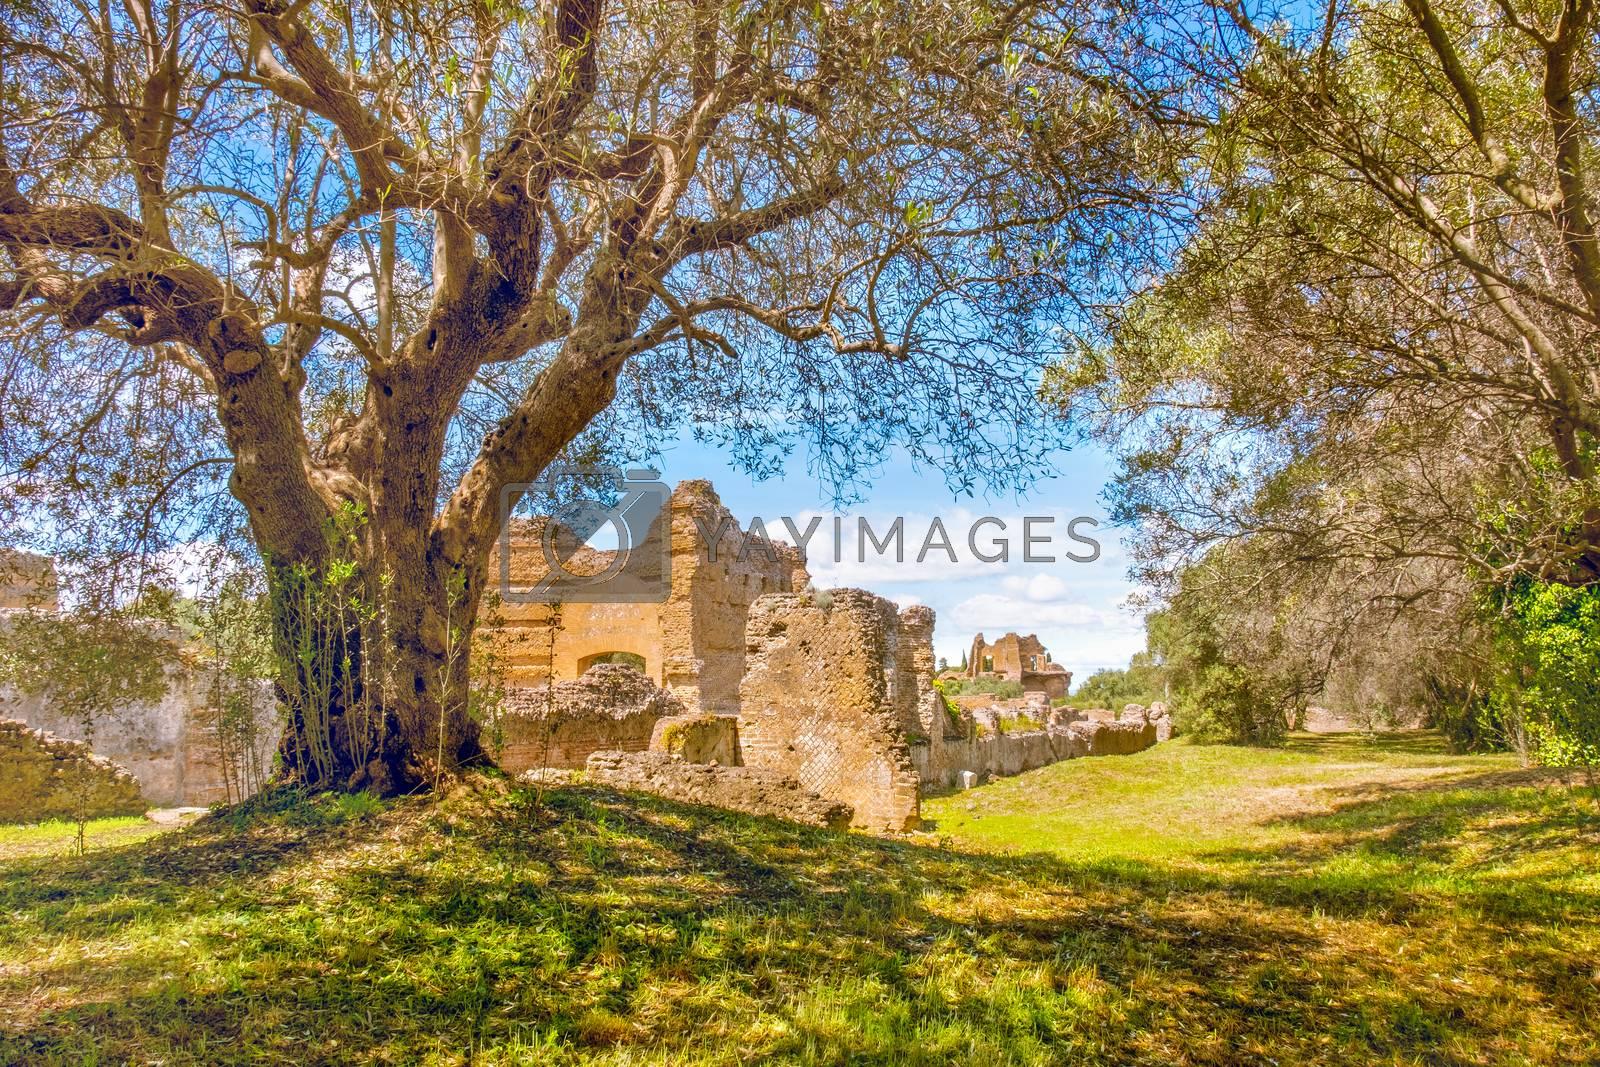 Italian countryside ancient ruins tree branches on sunny day in Tivoli .